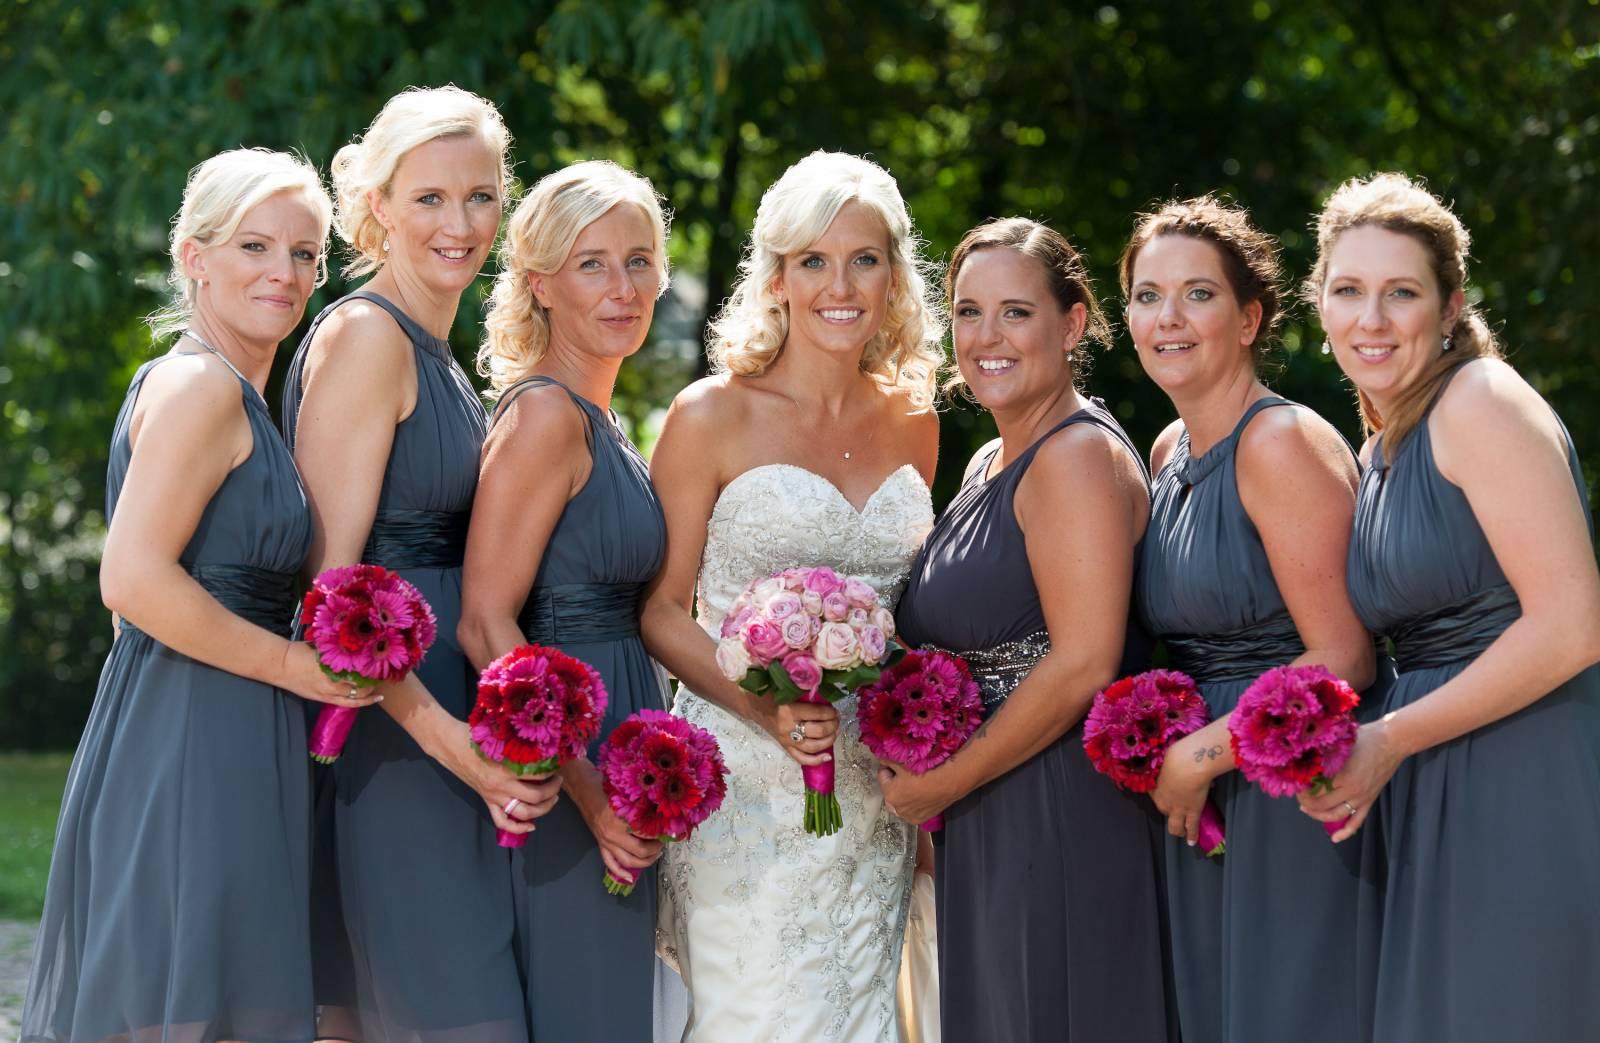 Foto Meeuw - House of Weddings - 14